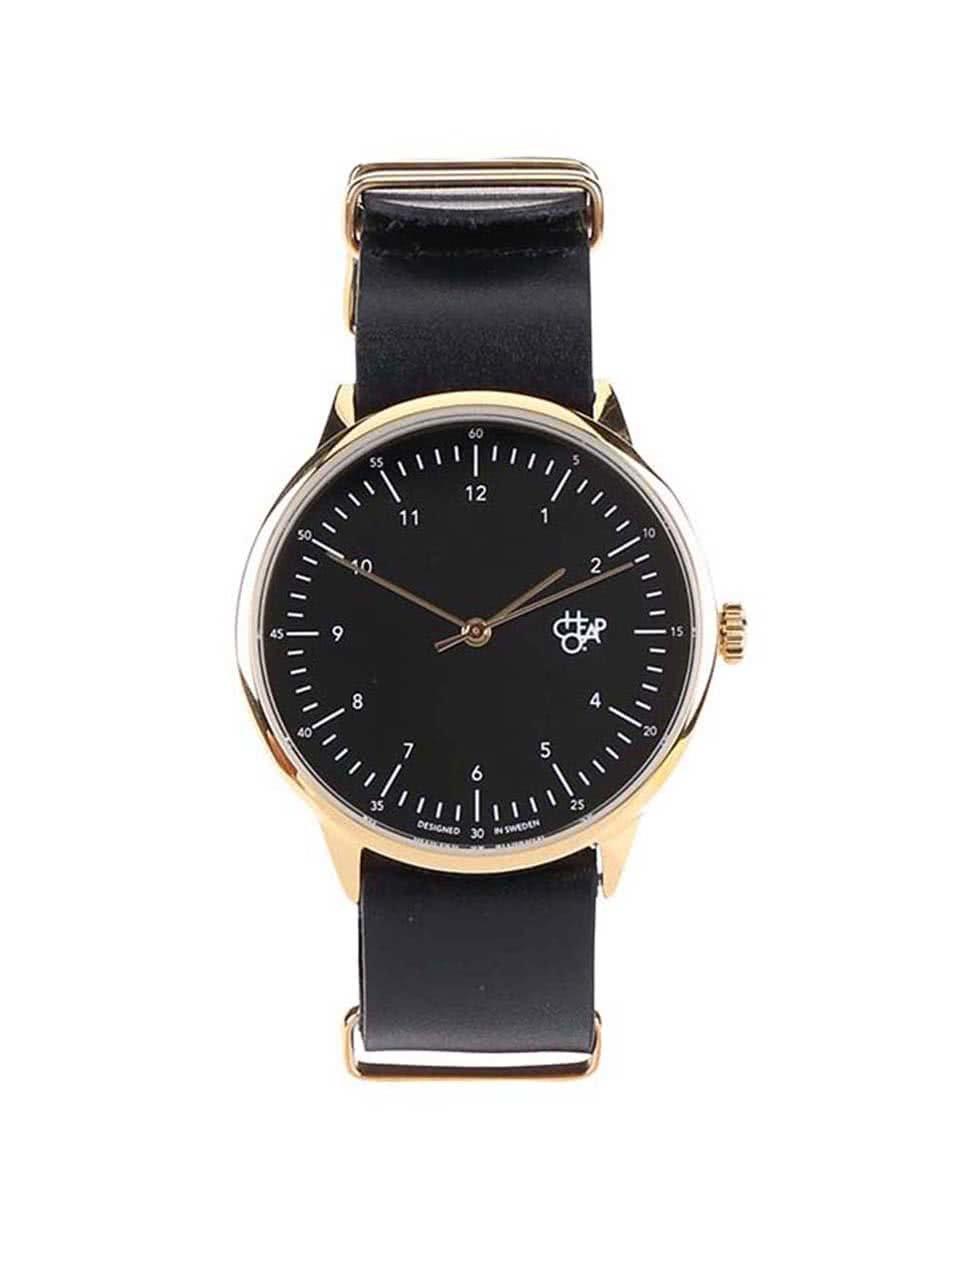 Černé unisex hodinky s koženým páskem Cheapo Harold Gold 407e21cea0